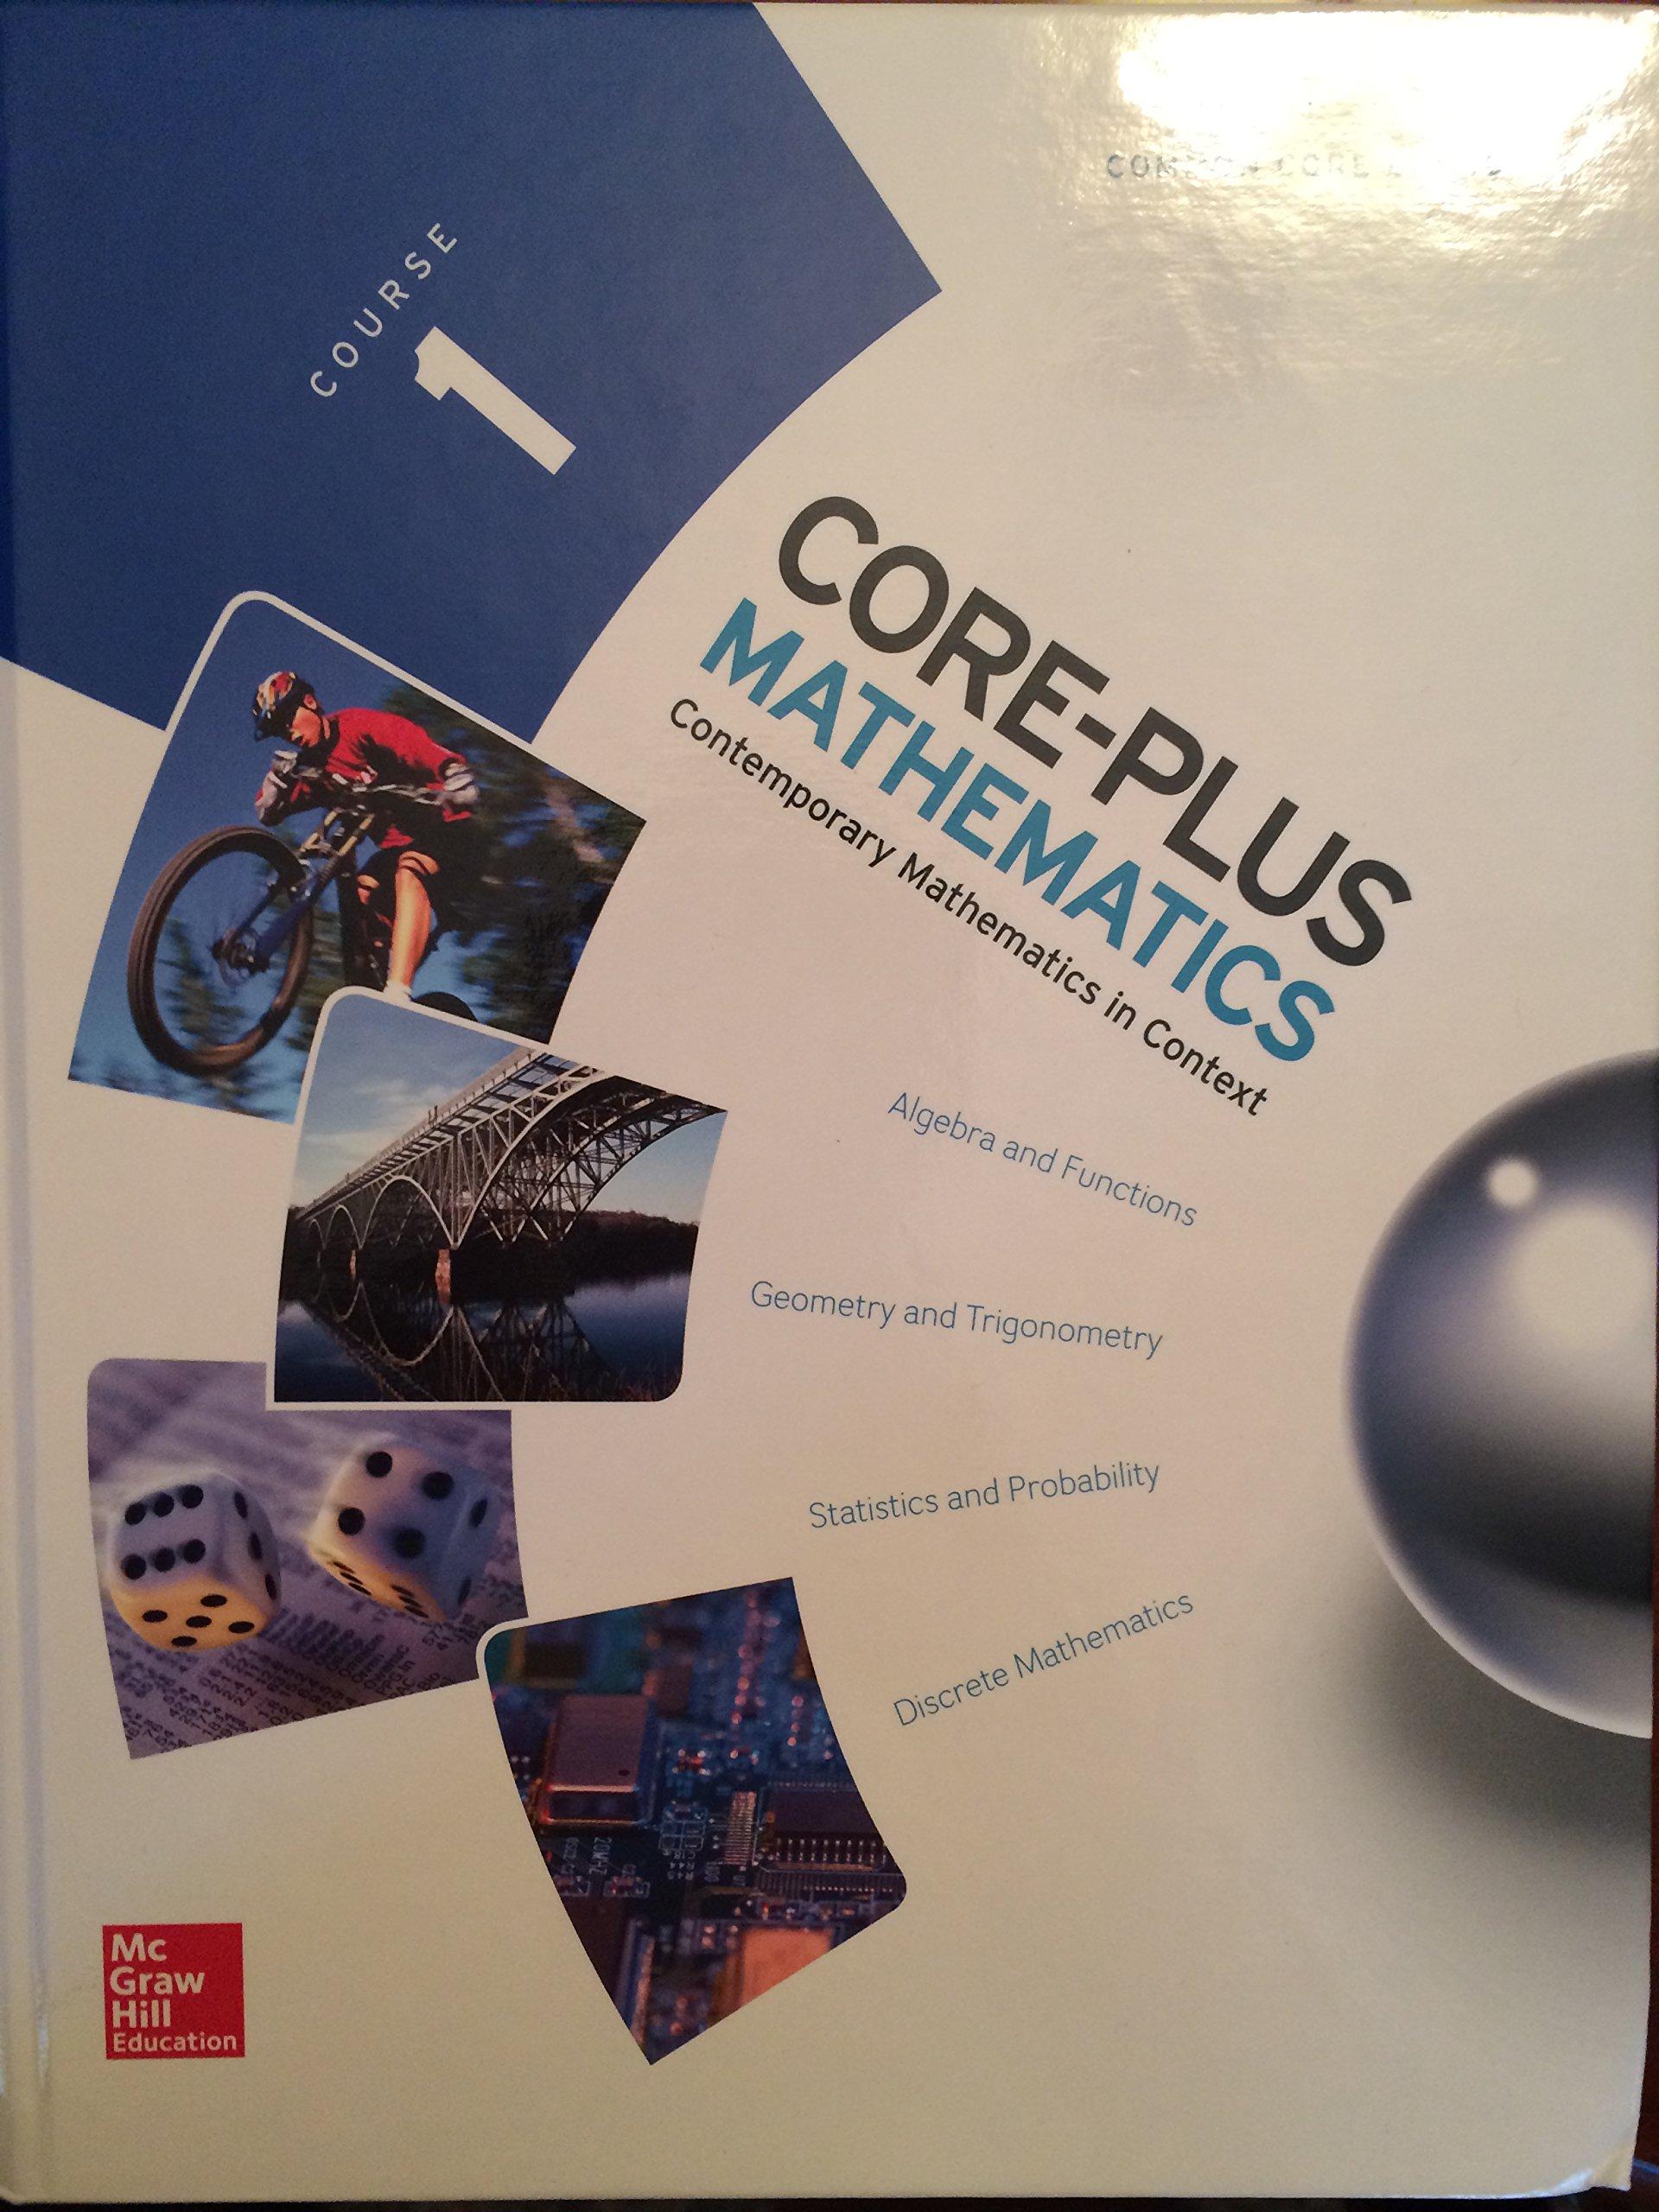 CORE PLUS MATHEMATICS COURSE 1 (Elc: Core Plus): Amazon.es: Mcgraw-Hill Education: Libros en idiomas extranjeros